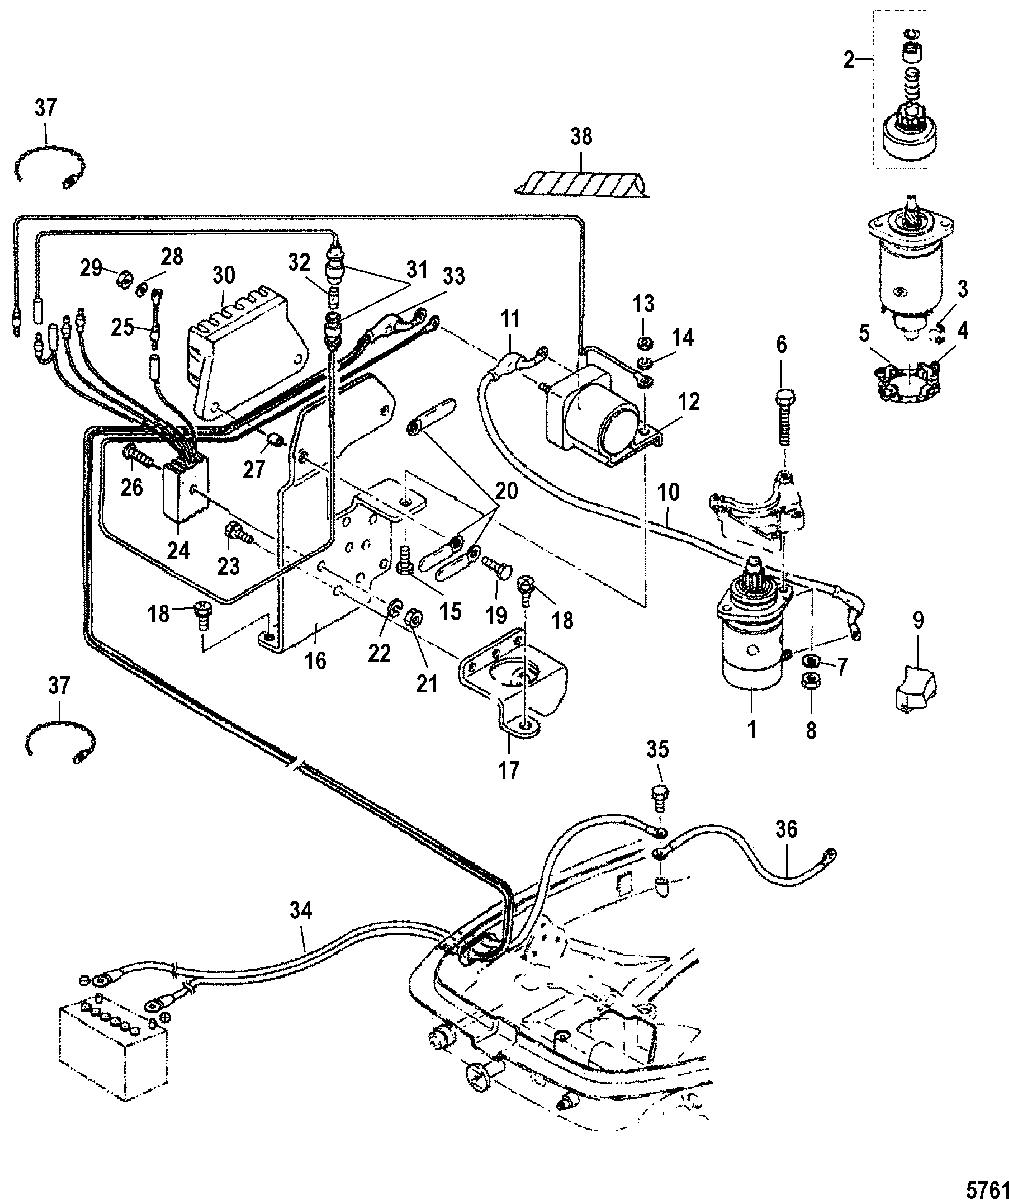 tohatsu 90 hp outboard wiring diagram oo 9304  mercury 25 hp wiring diagram free diagram  oo 9304  mercury 25 hp wiring diagram